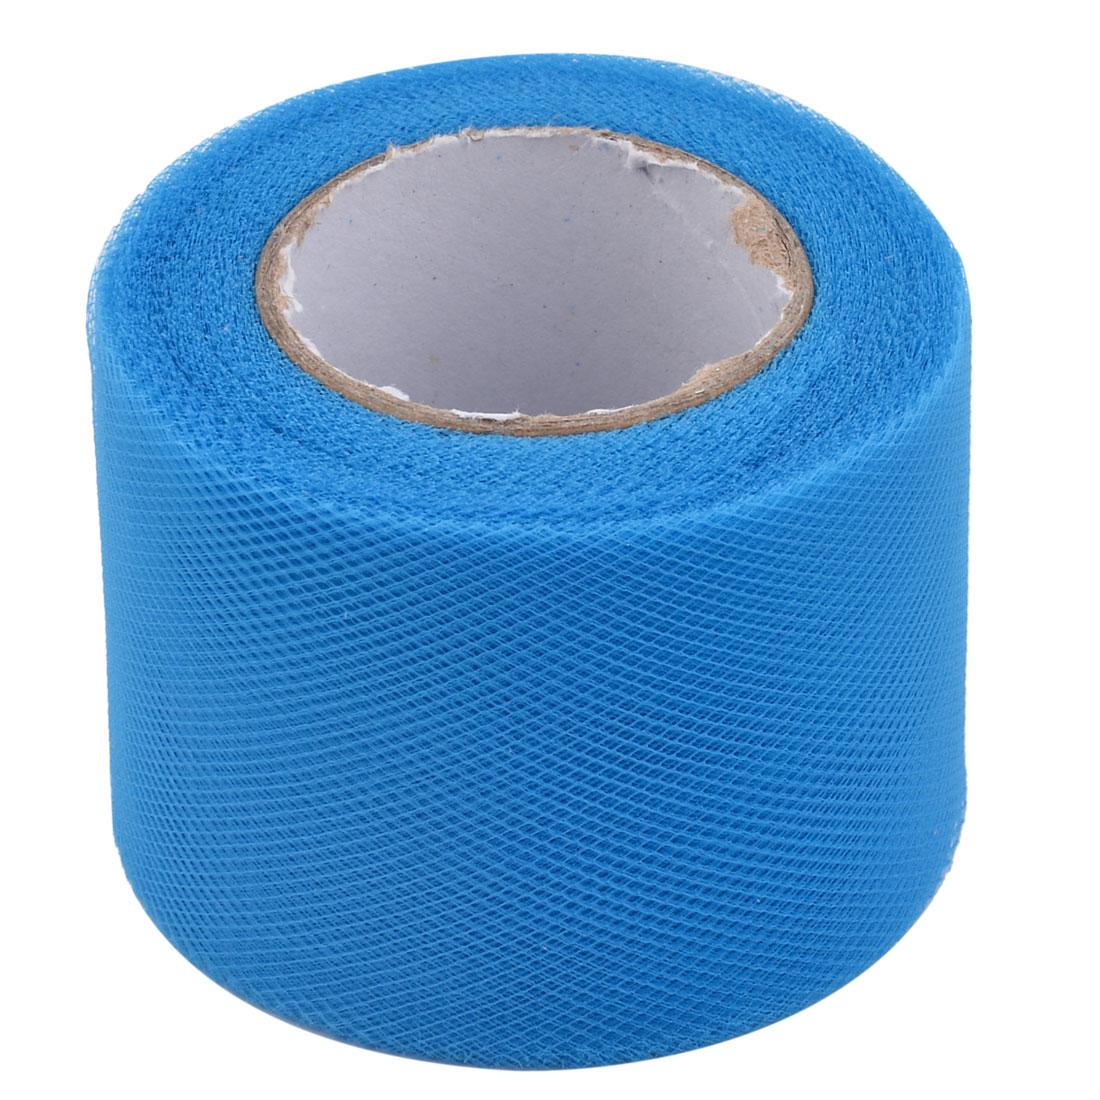 Festival Polyester Tutu Handmade Dress Decor Tulle Spool Roll Blue 2 Inch x 25 Yards